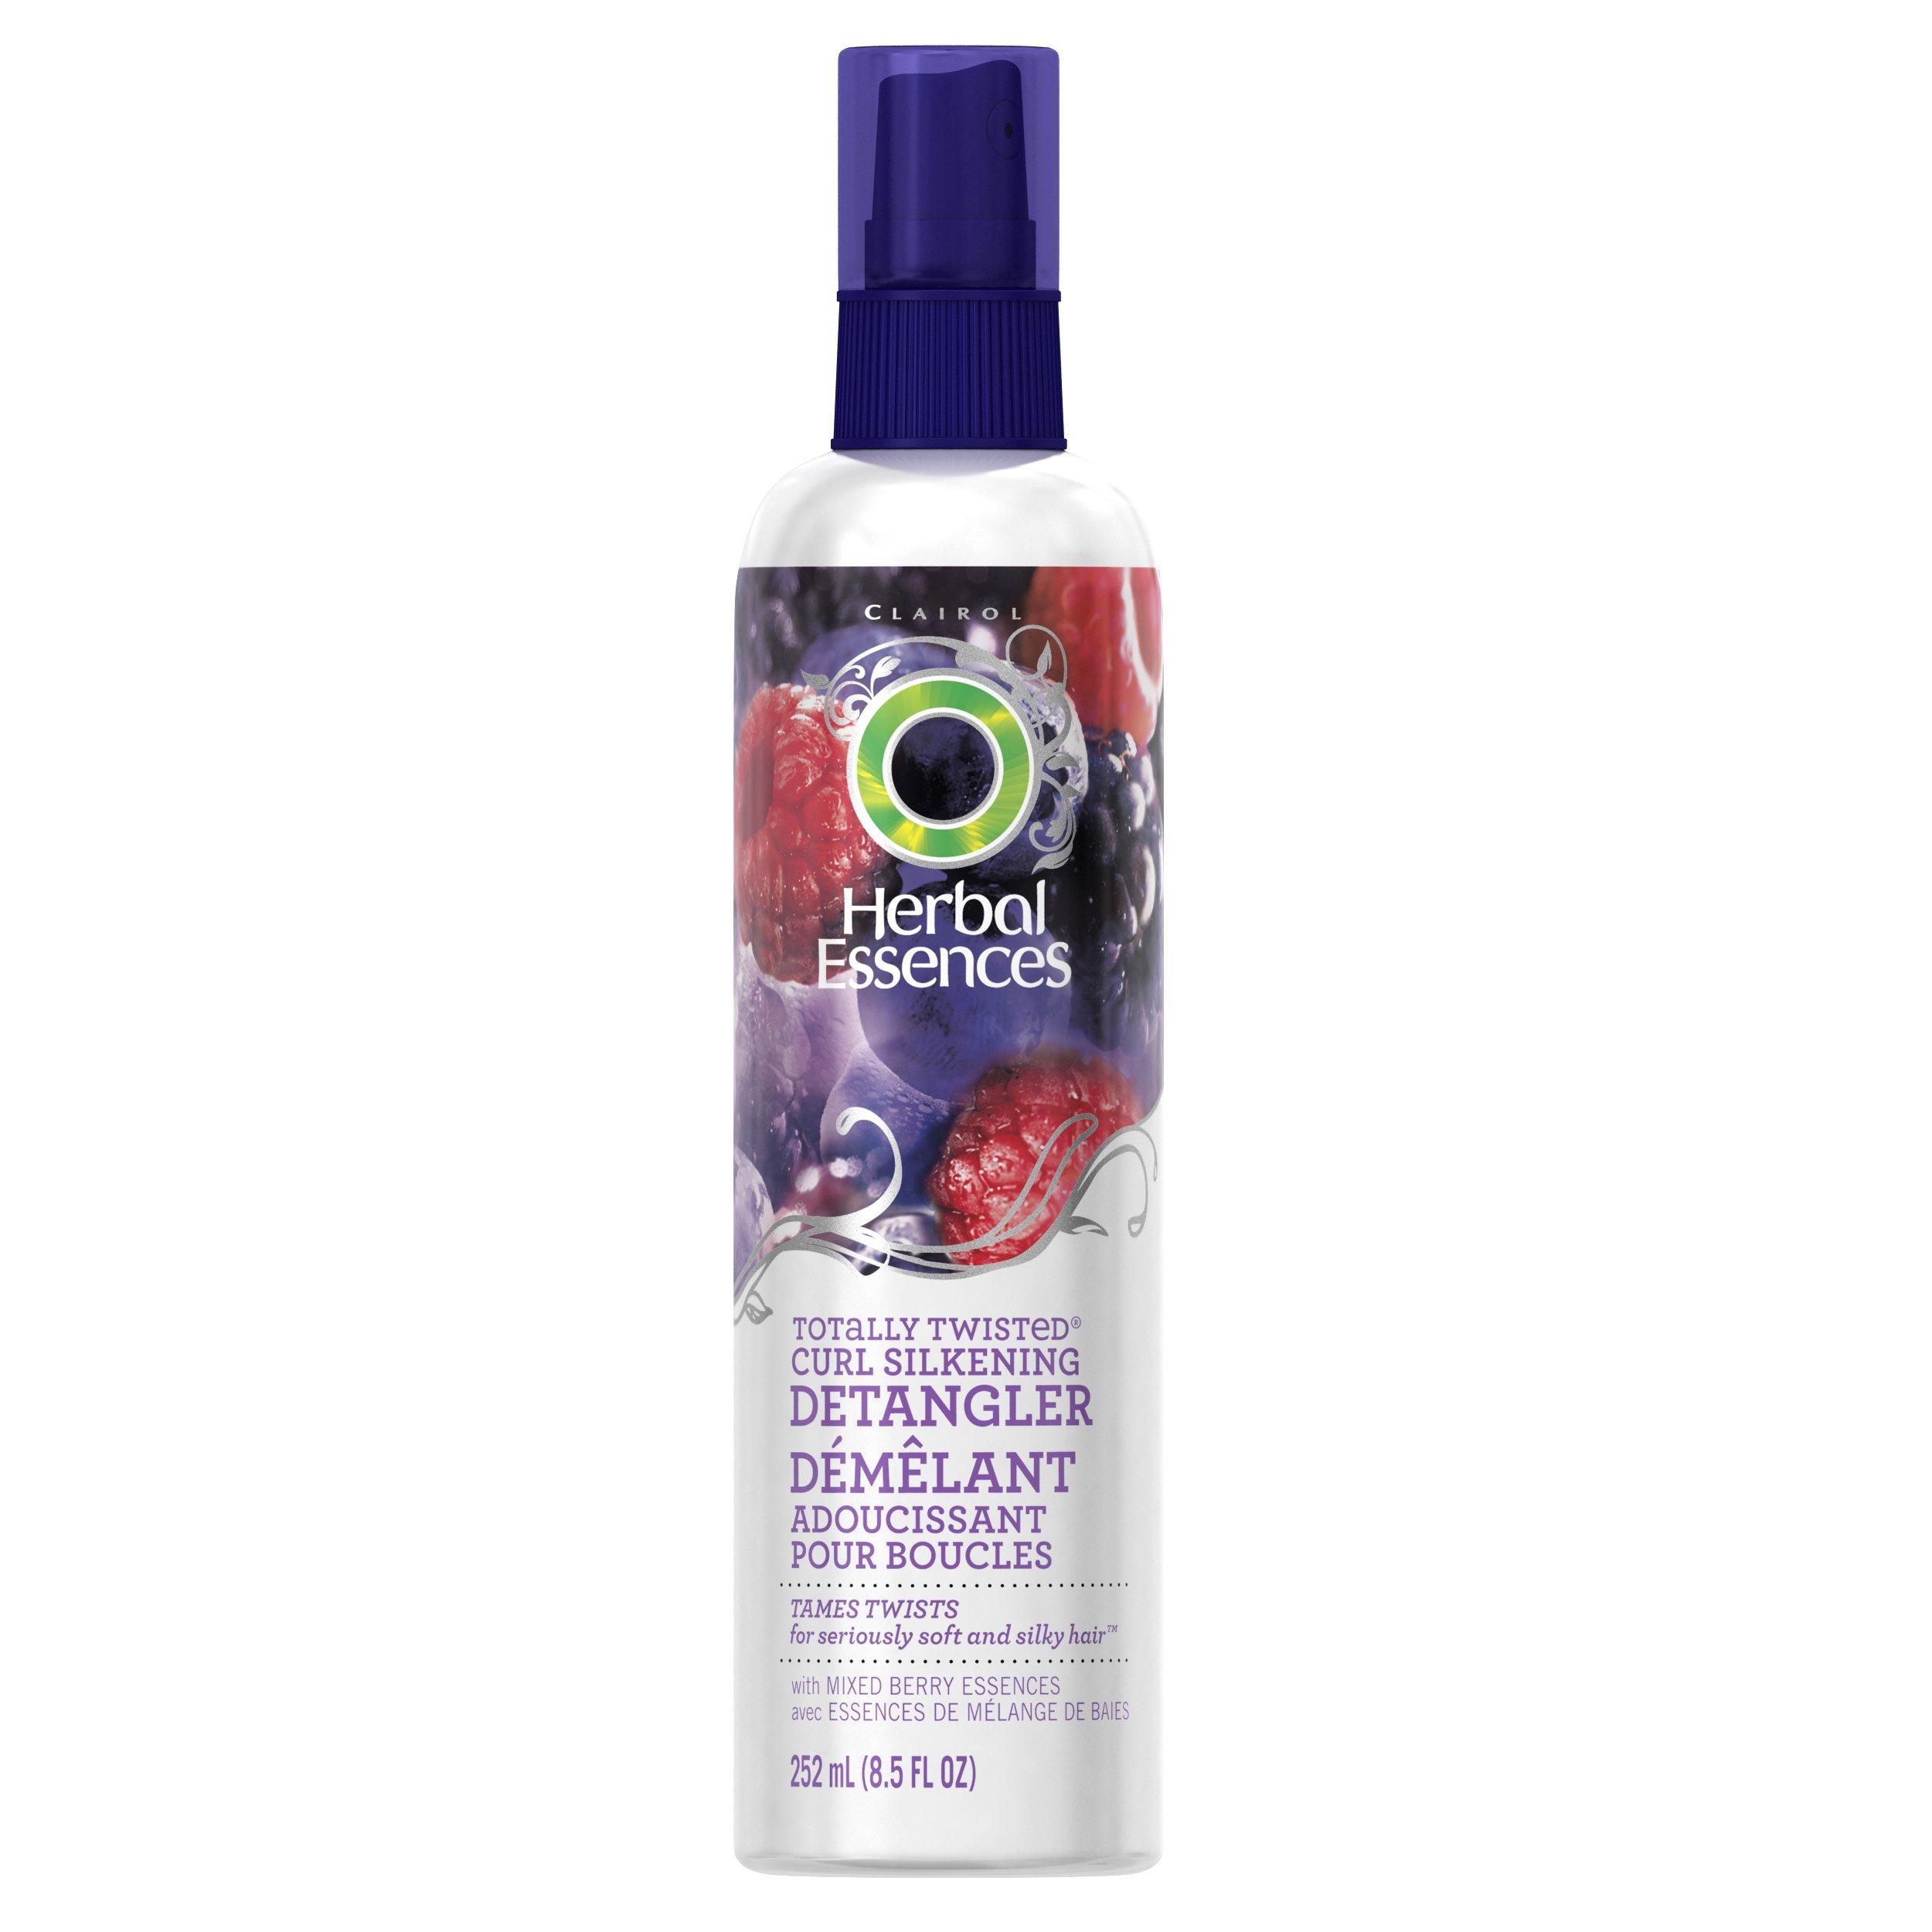 Herbal Essences Totally Twisted Curl Silkening Detangler Hair Care 8.5 Fl Oz